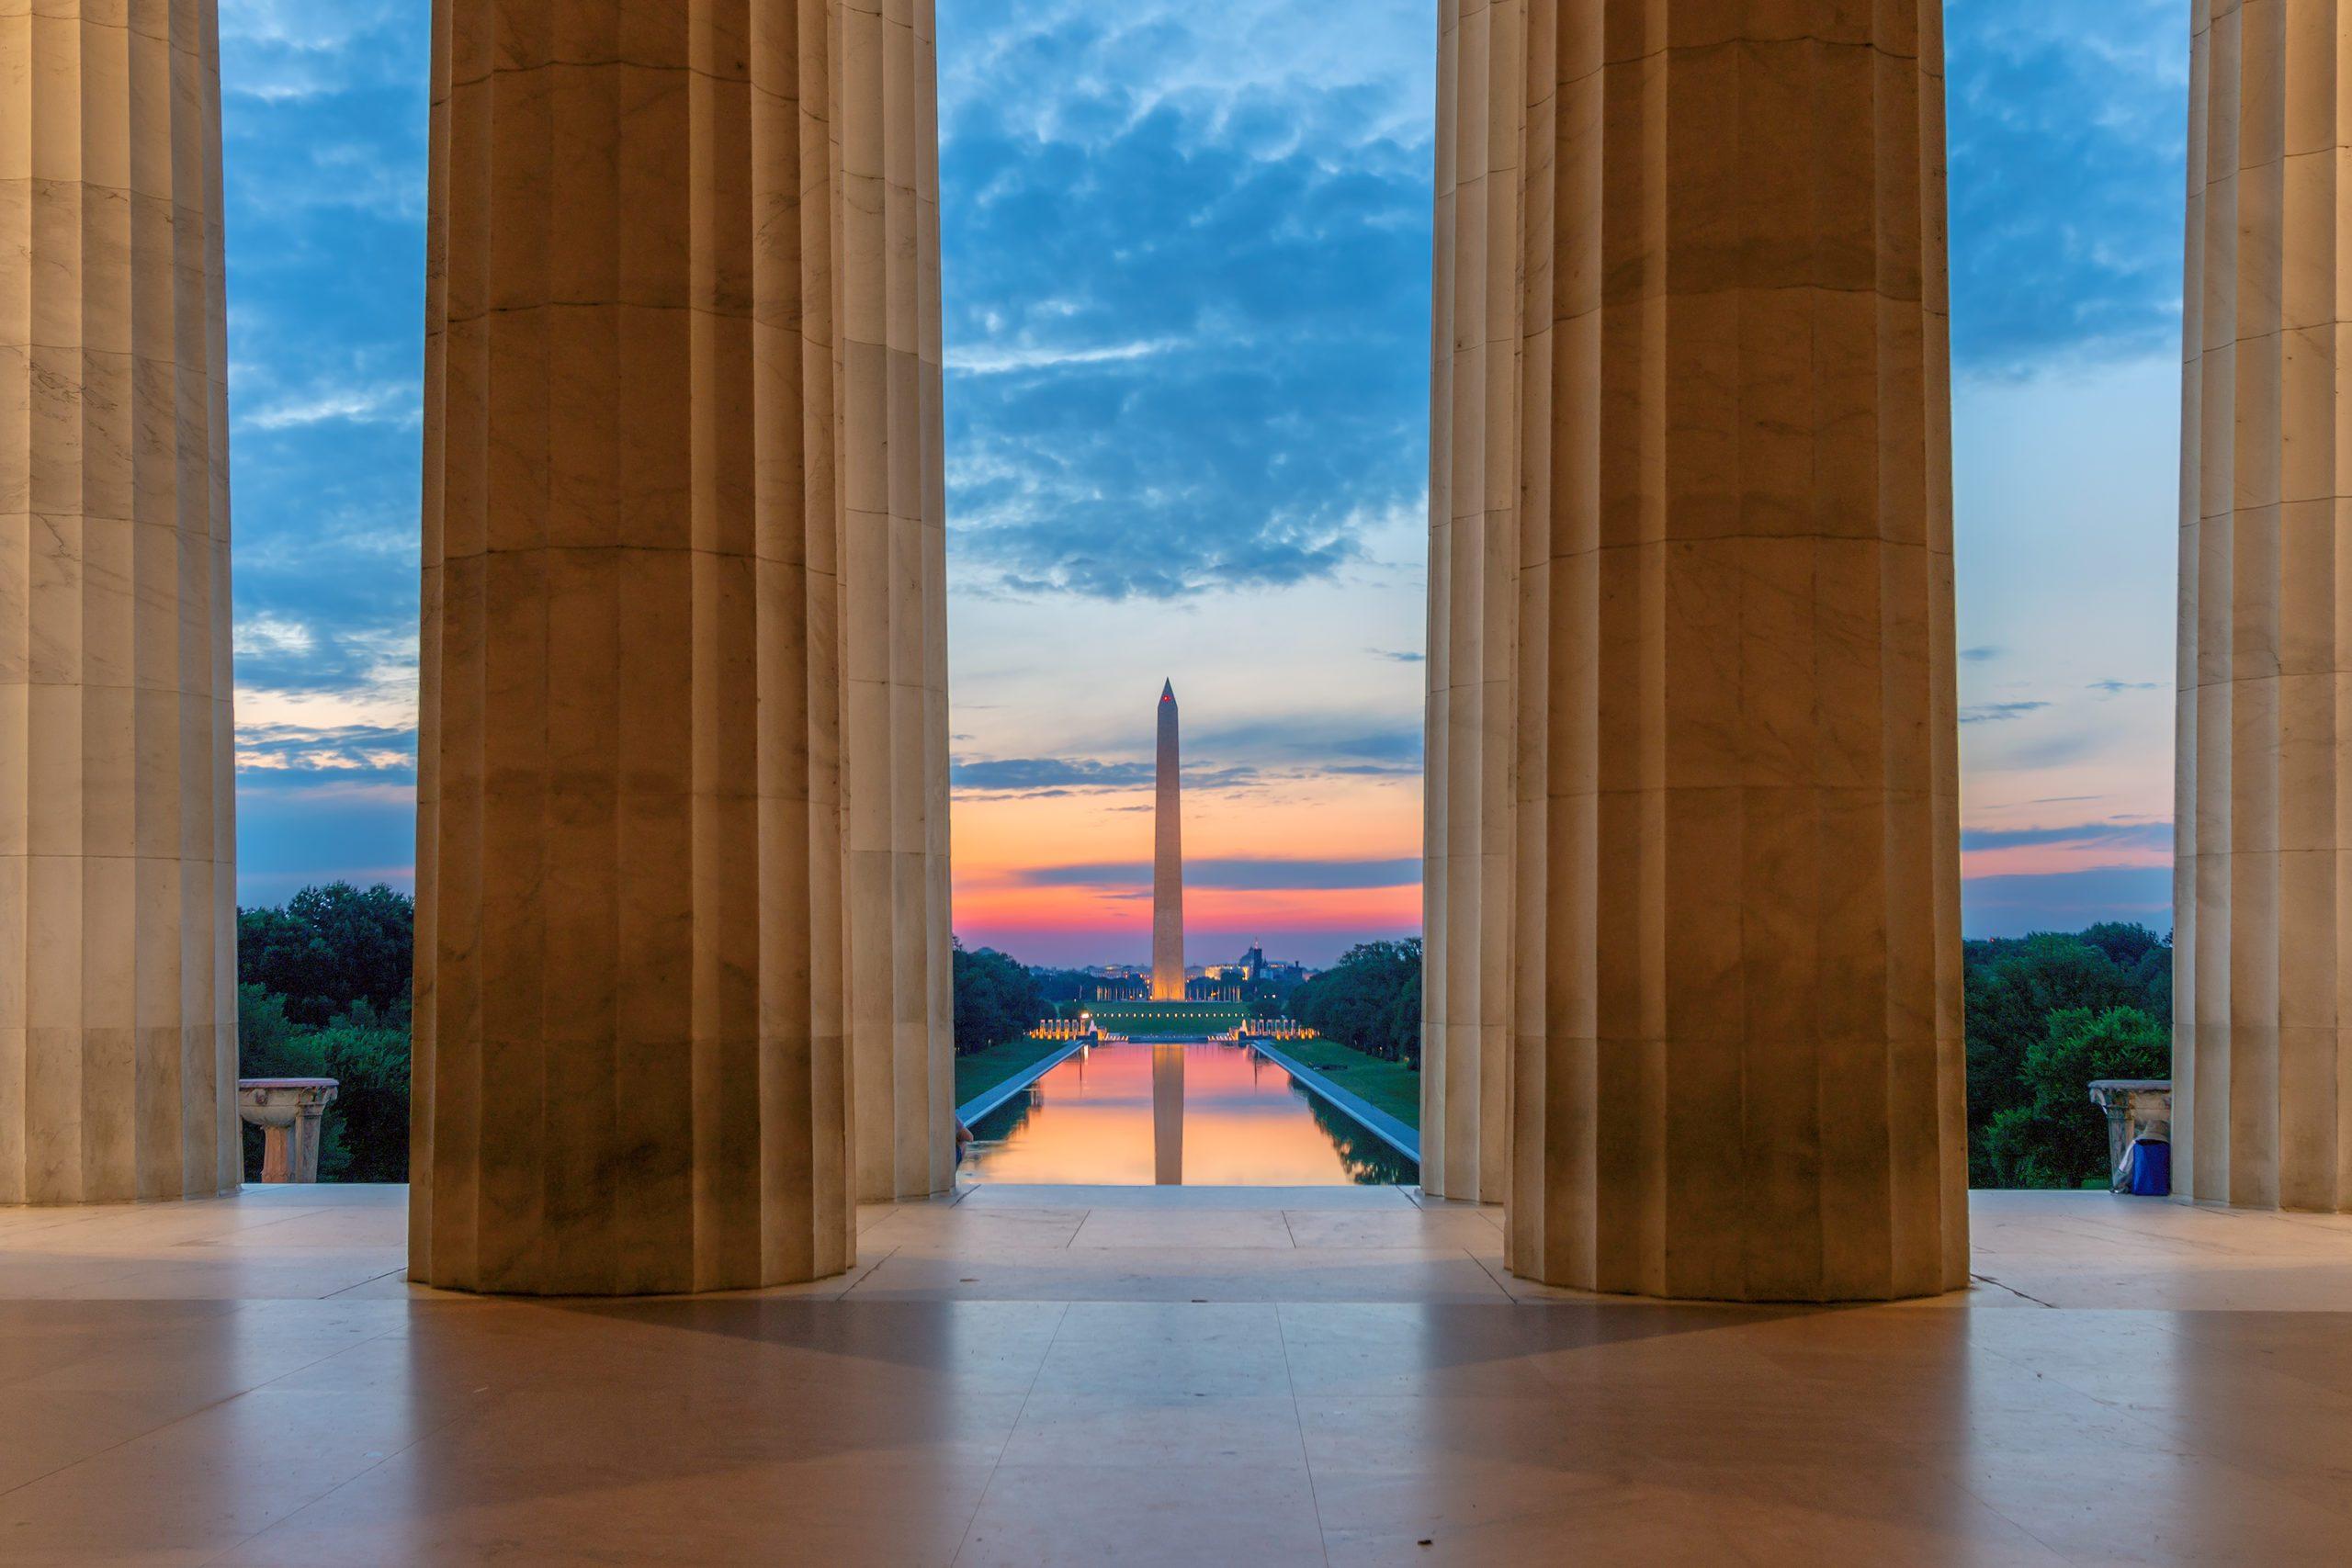 Lincoln Memorial at sunrise in Washington, D.C.